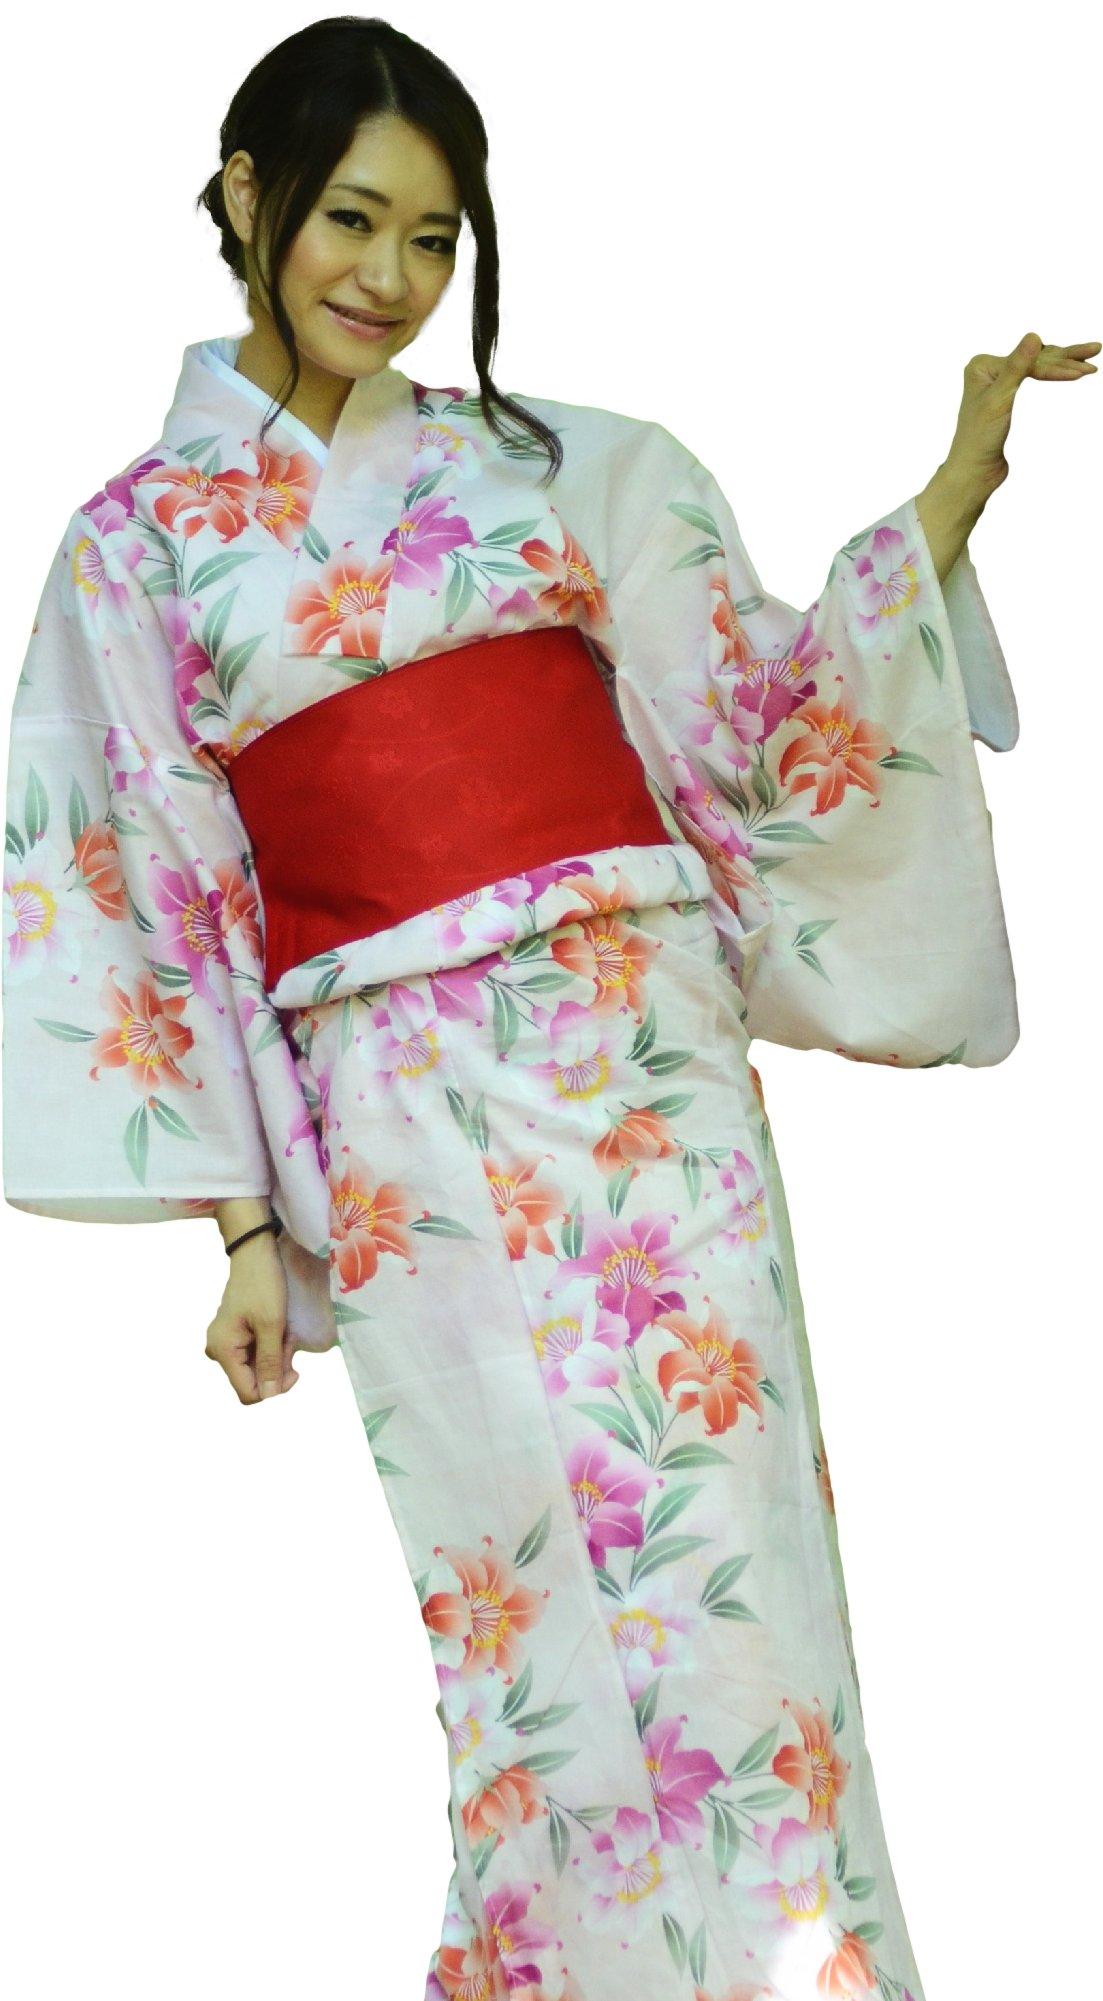 sakura Women Japanese Yukata Pre tied obi belt set with sandals / white pink and lily pattern